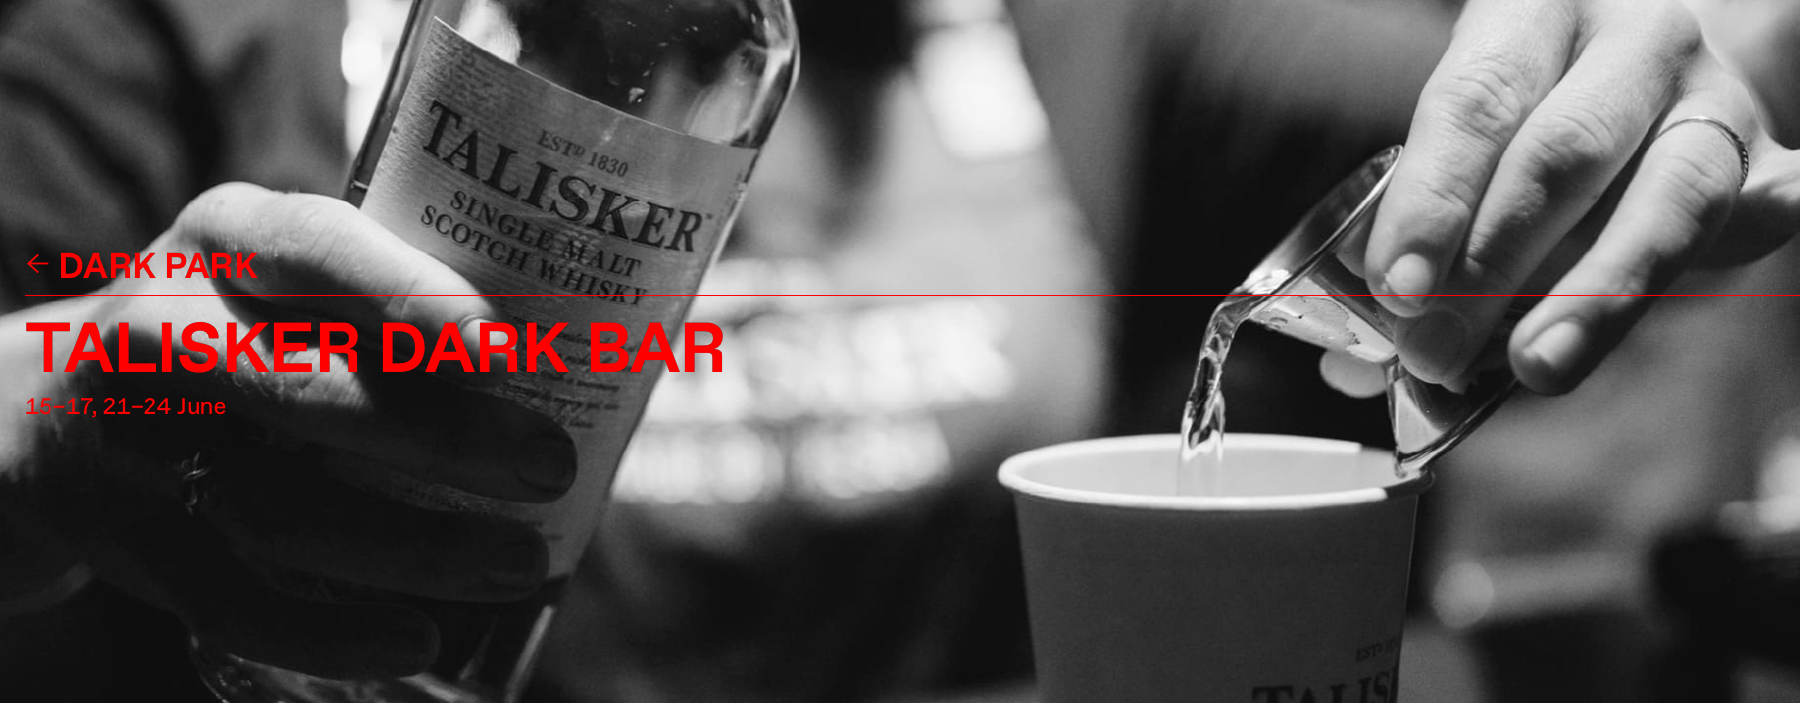 blogwhisky.png